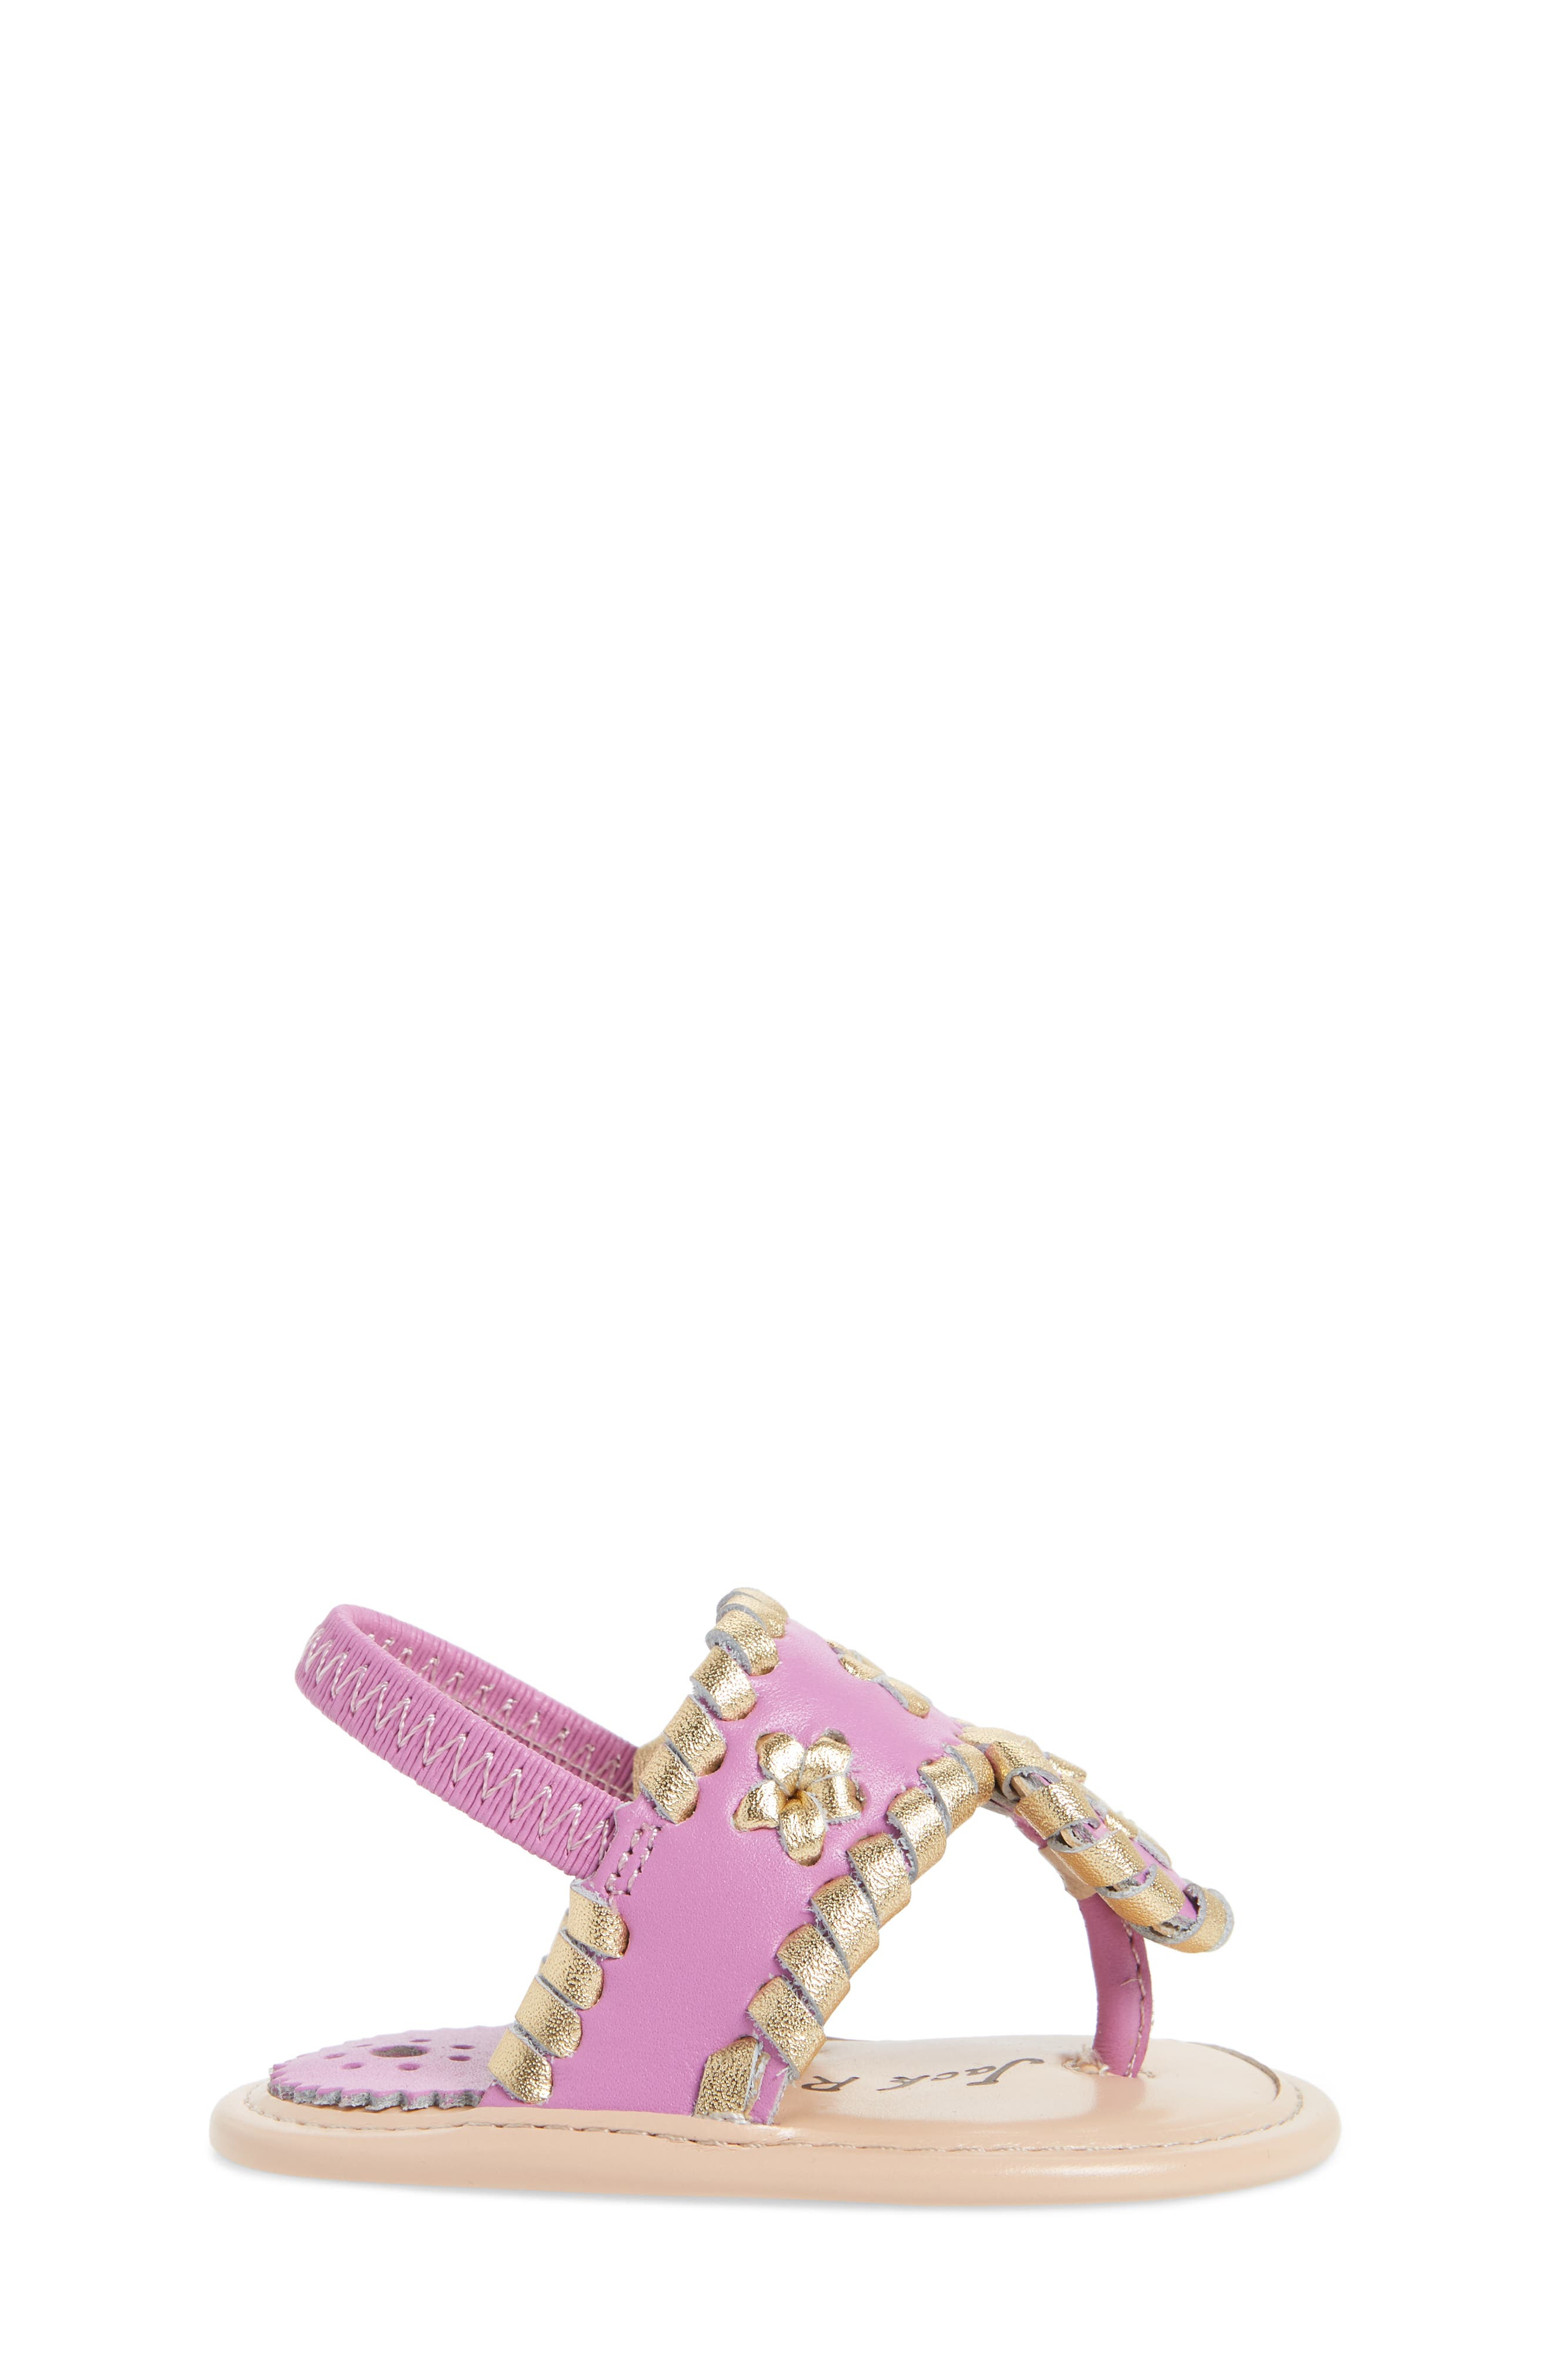 Hollis Sandal,                             Alternate thumbnail 3, color,                             Lavender Pink/ Gold Leather